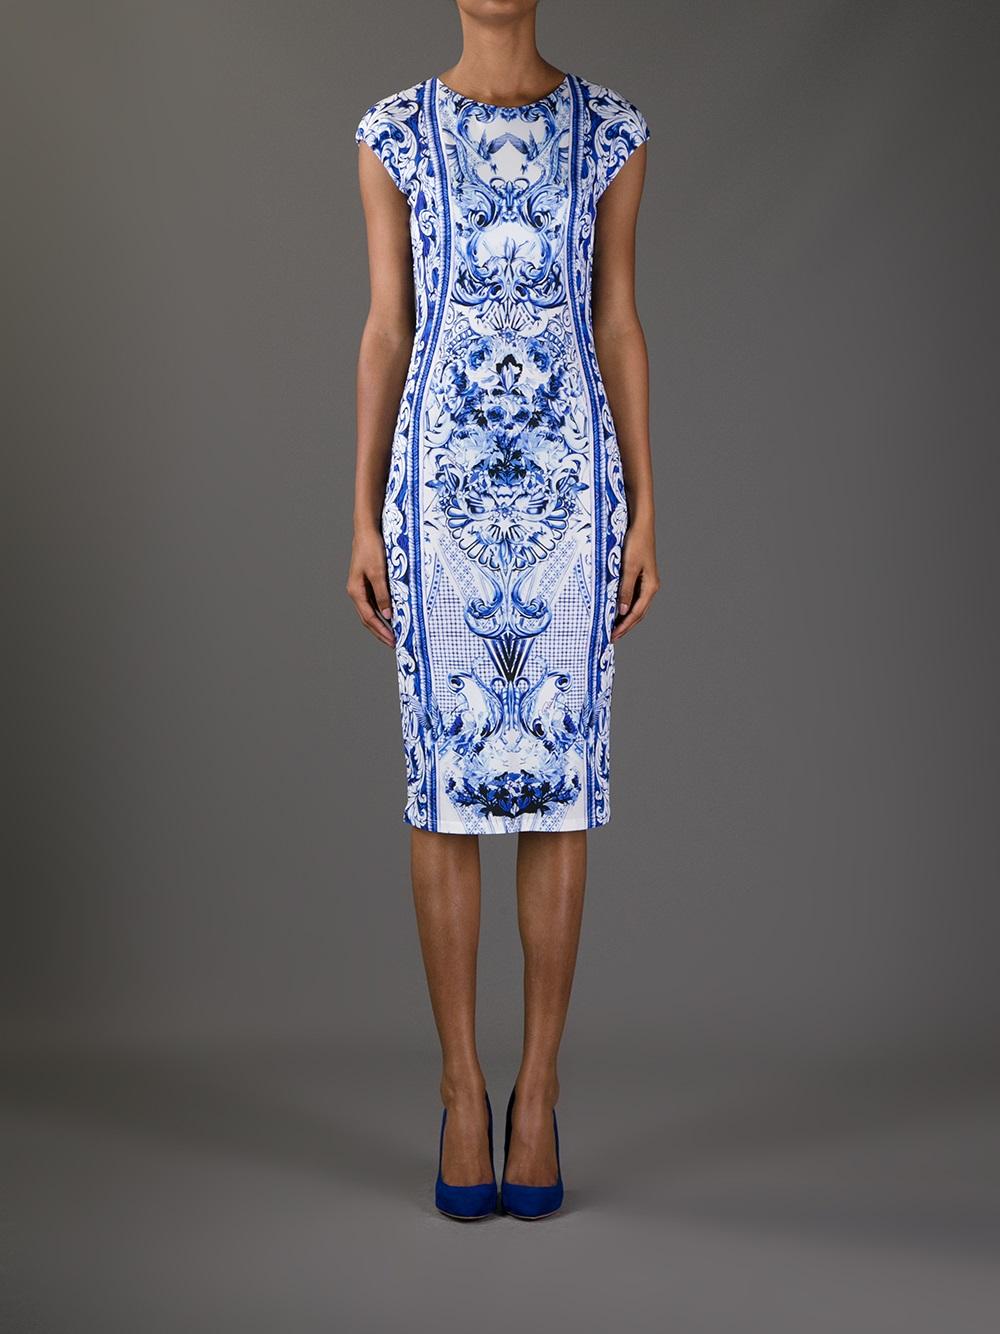 Roberto Cavalli Printed Dress In White Lyst